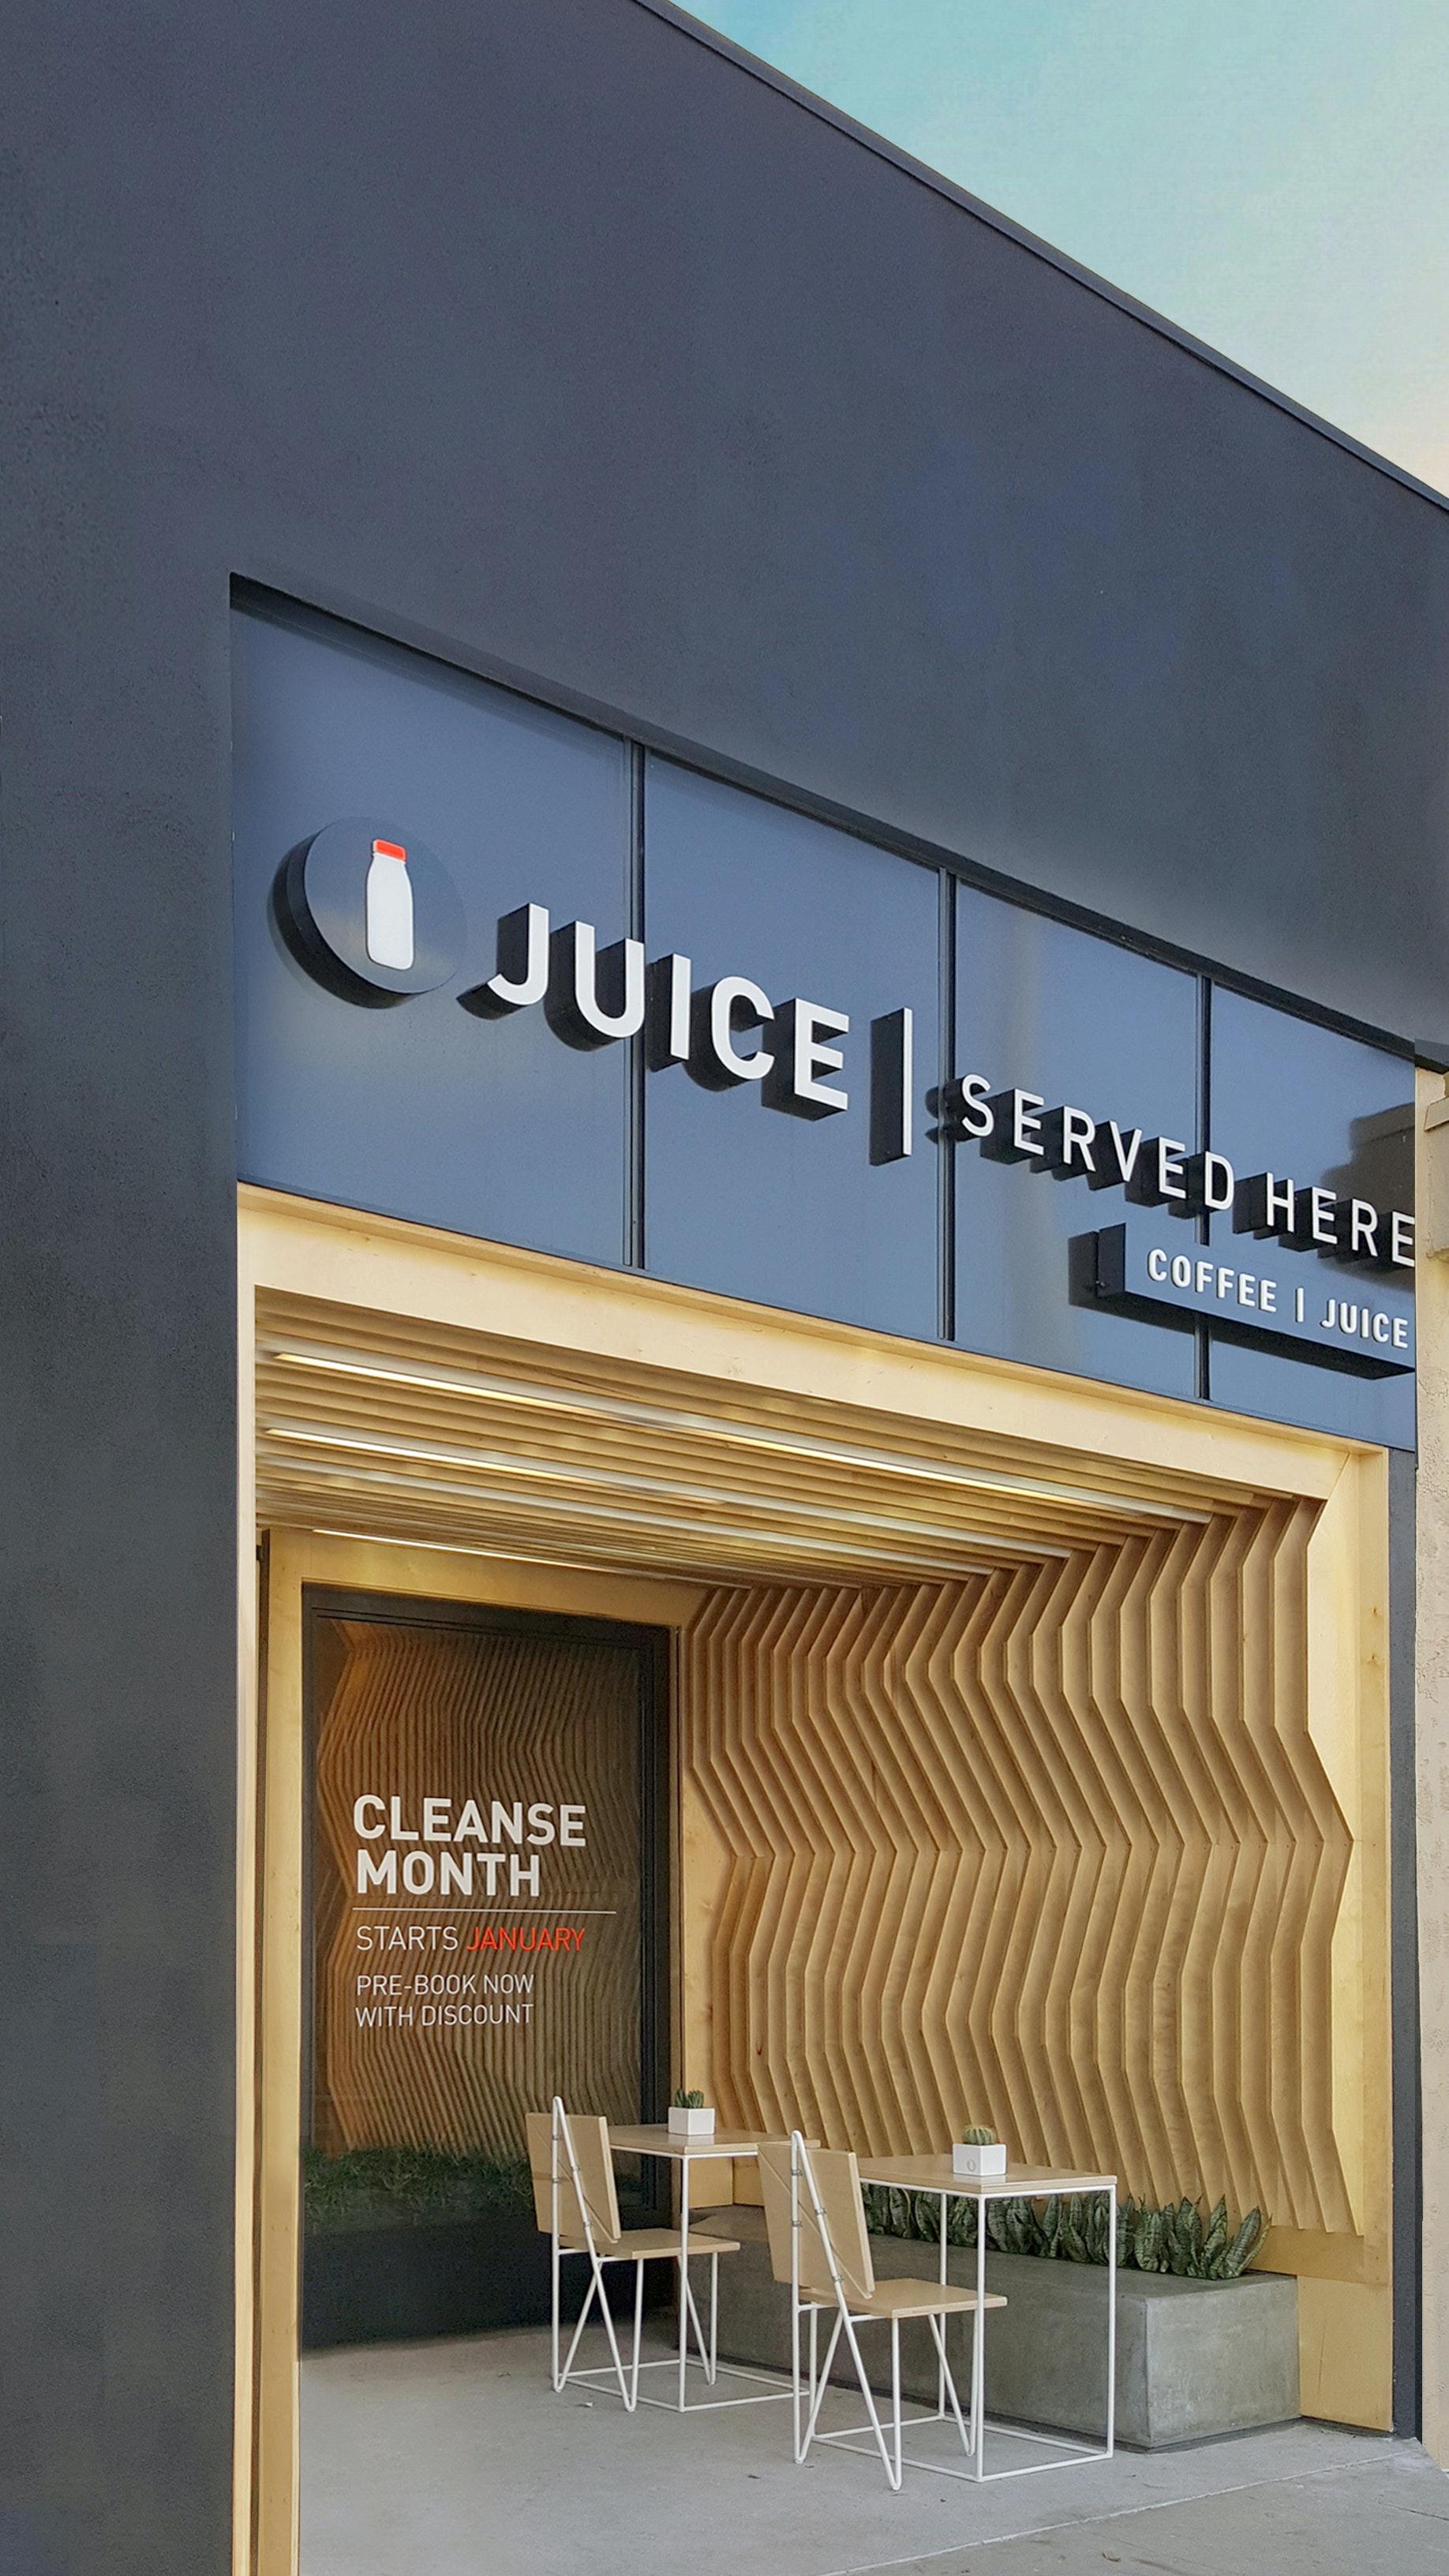 Juice Served Here - Studio City | A-Industrial Design/Build